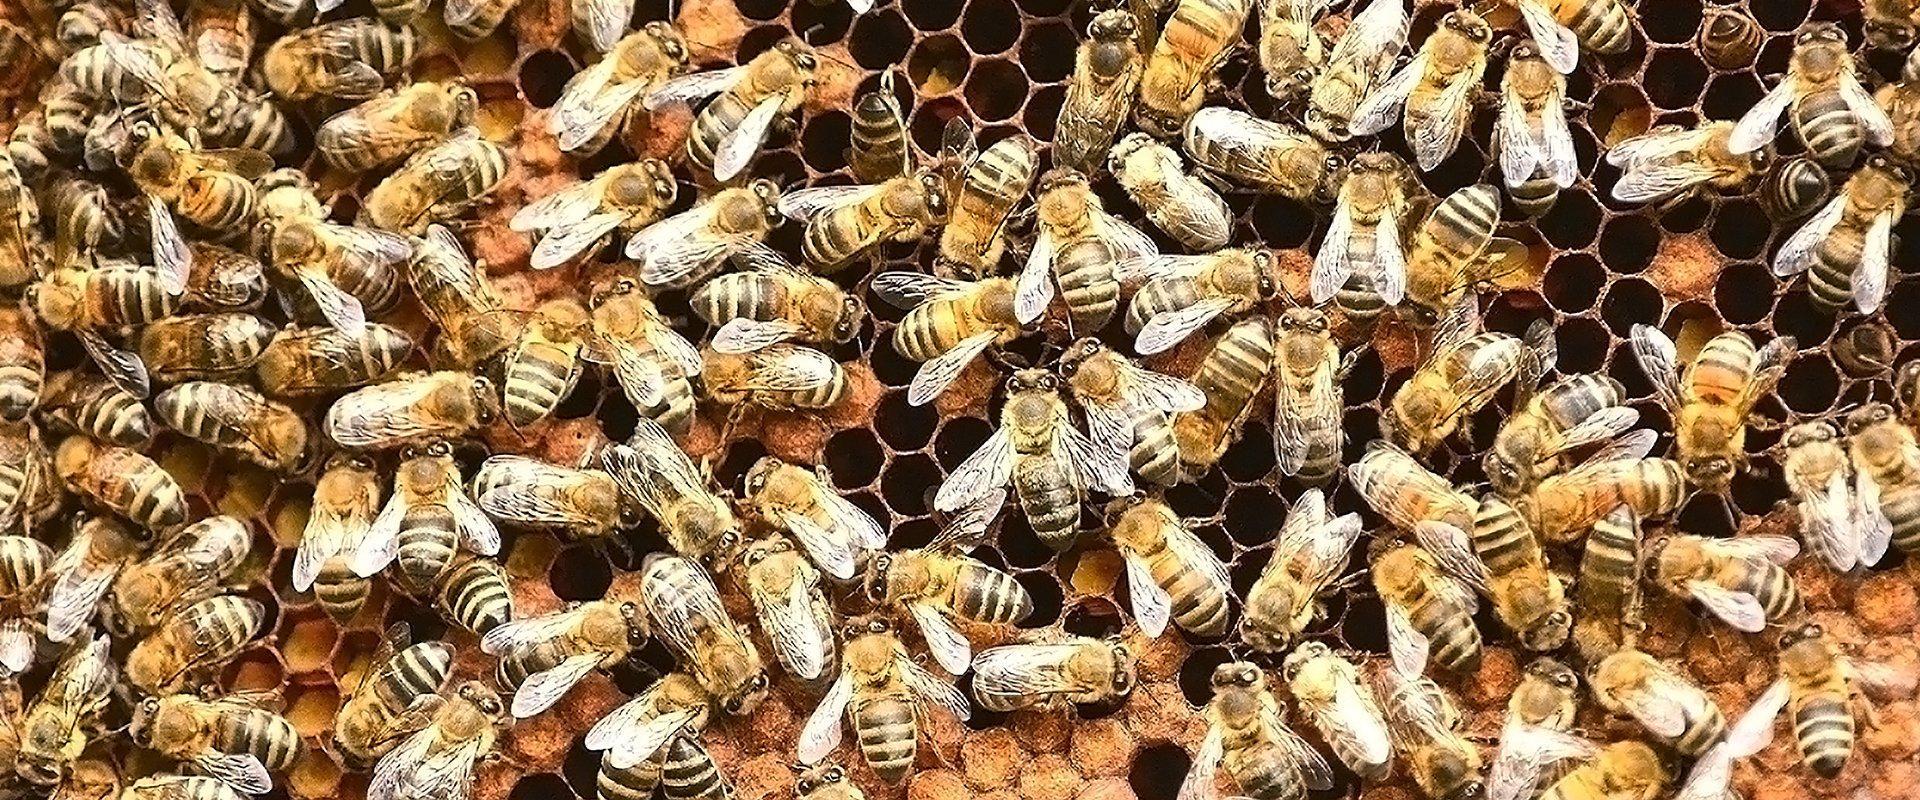 many bees up close